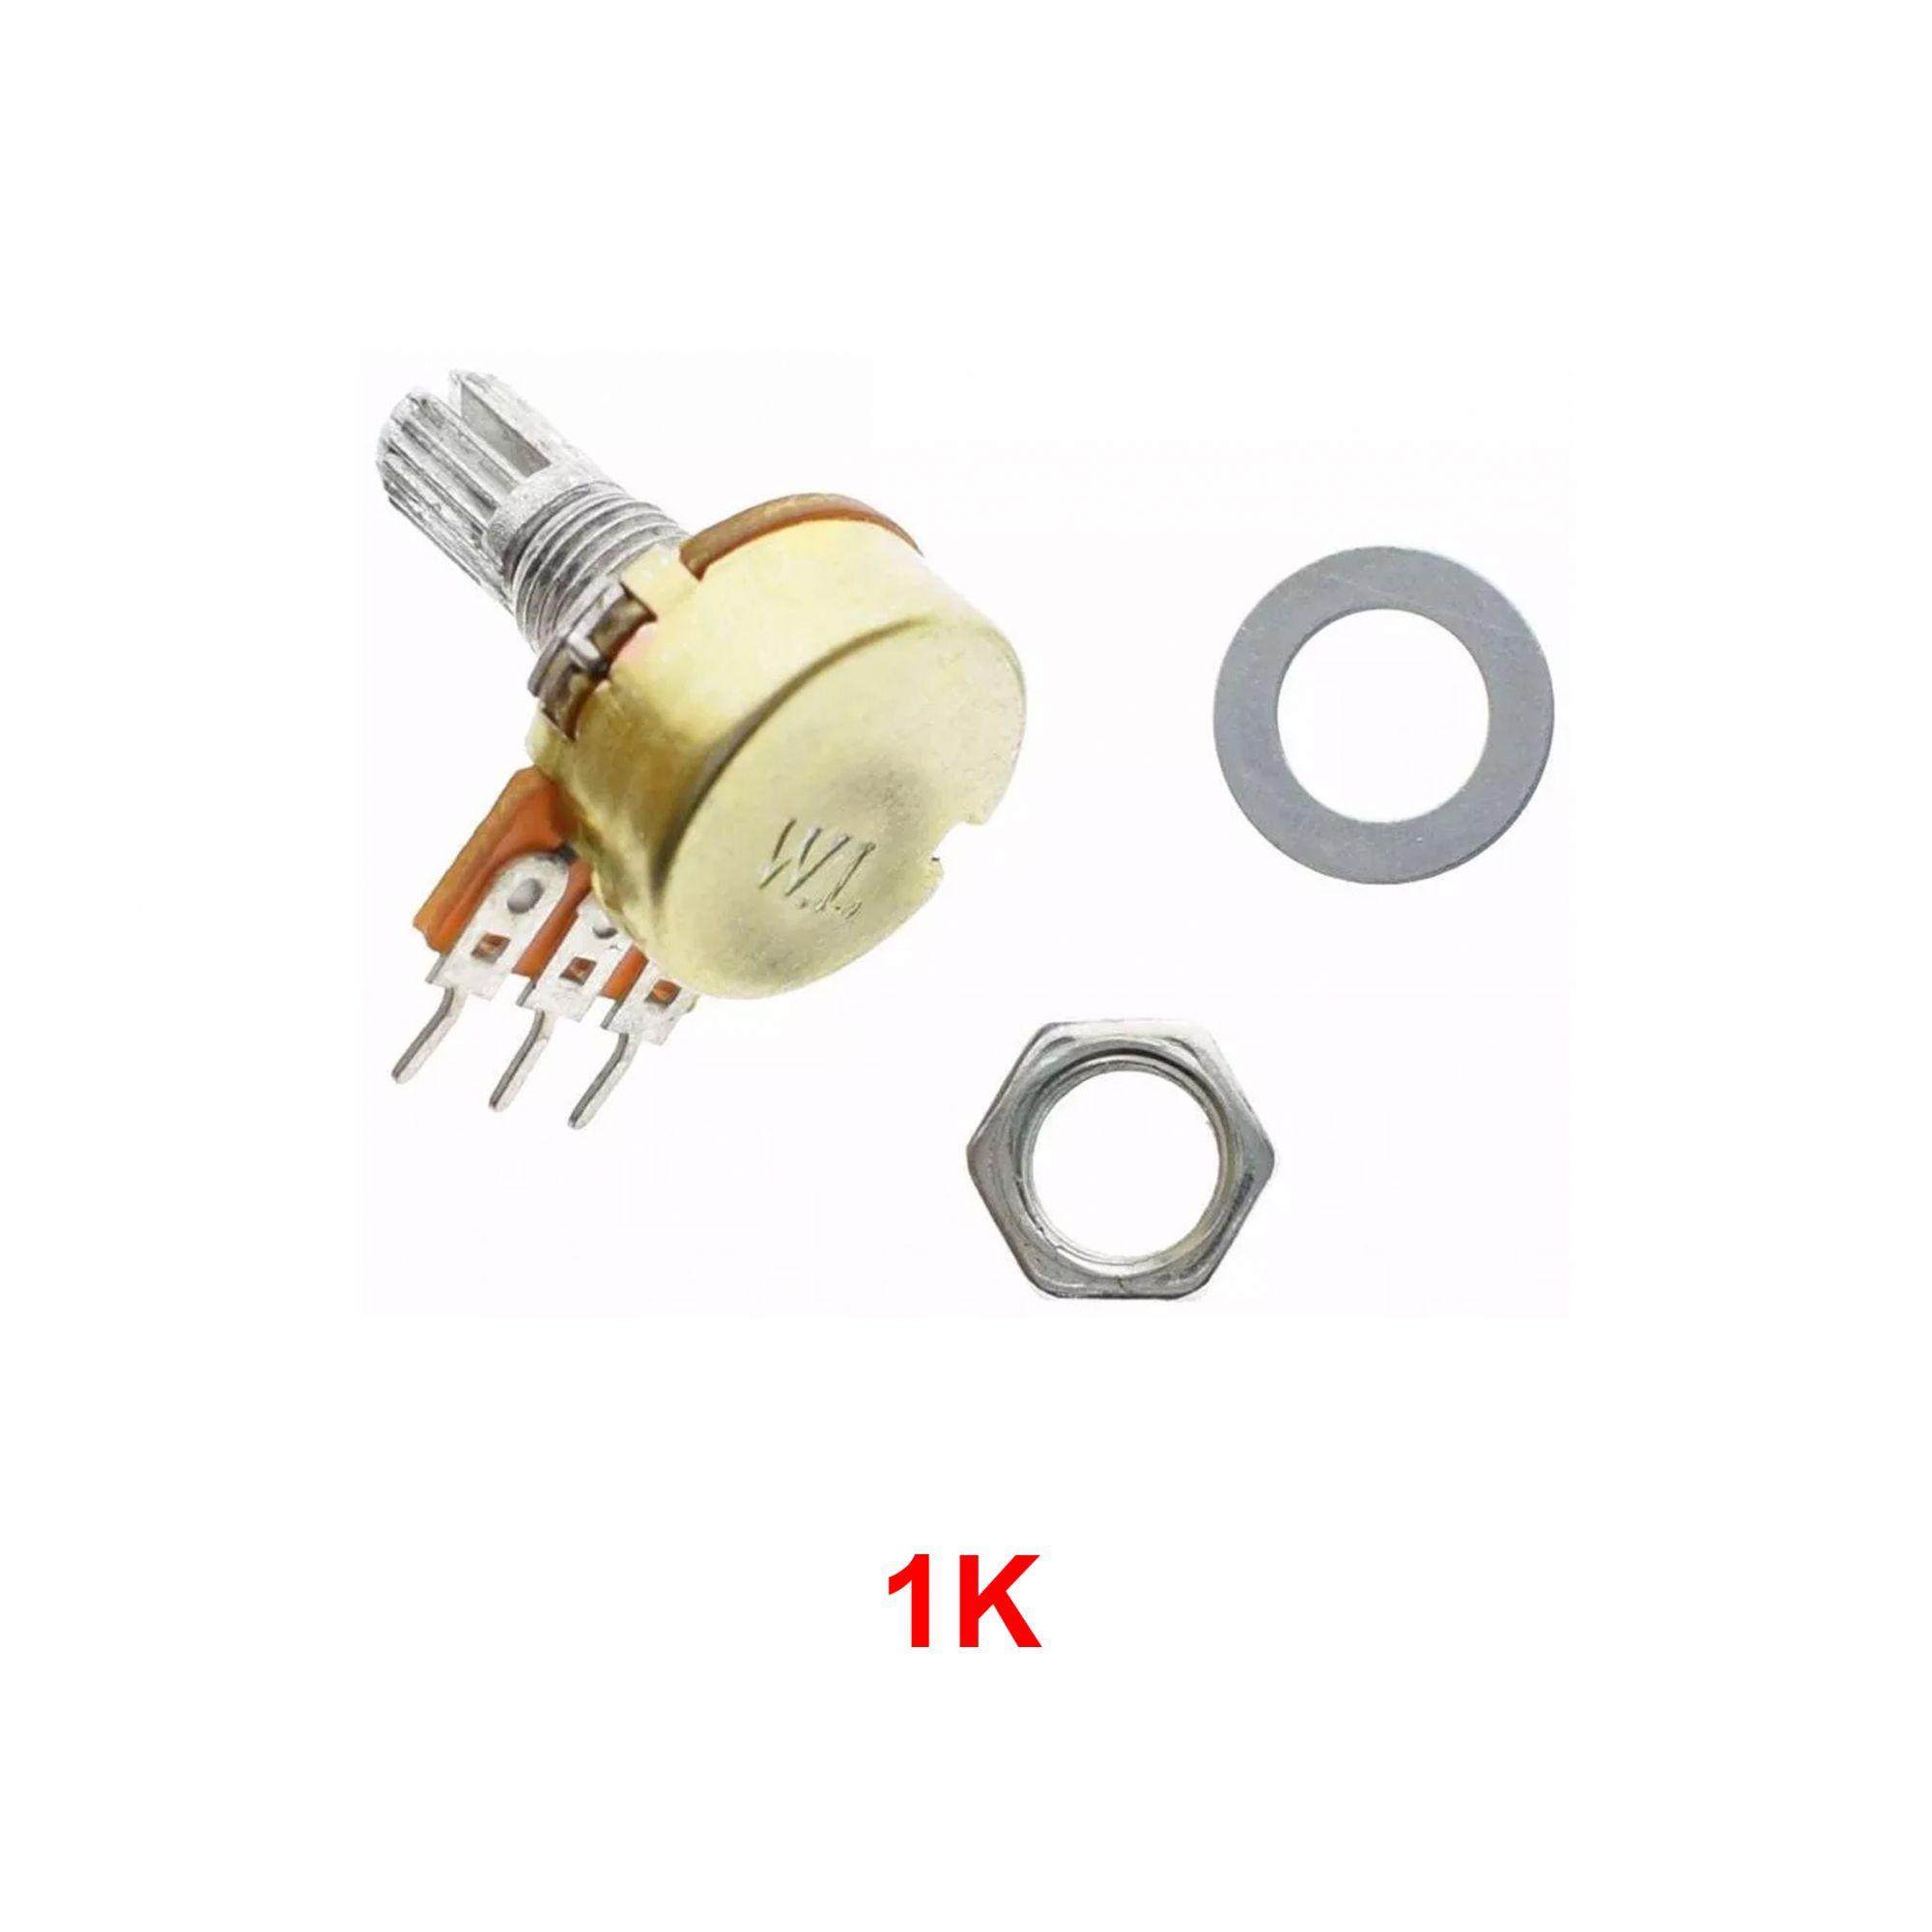 Potenciômetro 1k Linear Estriado 20mm WH148 B5K L20